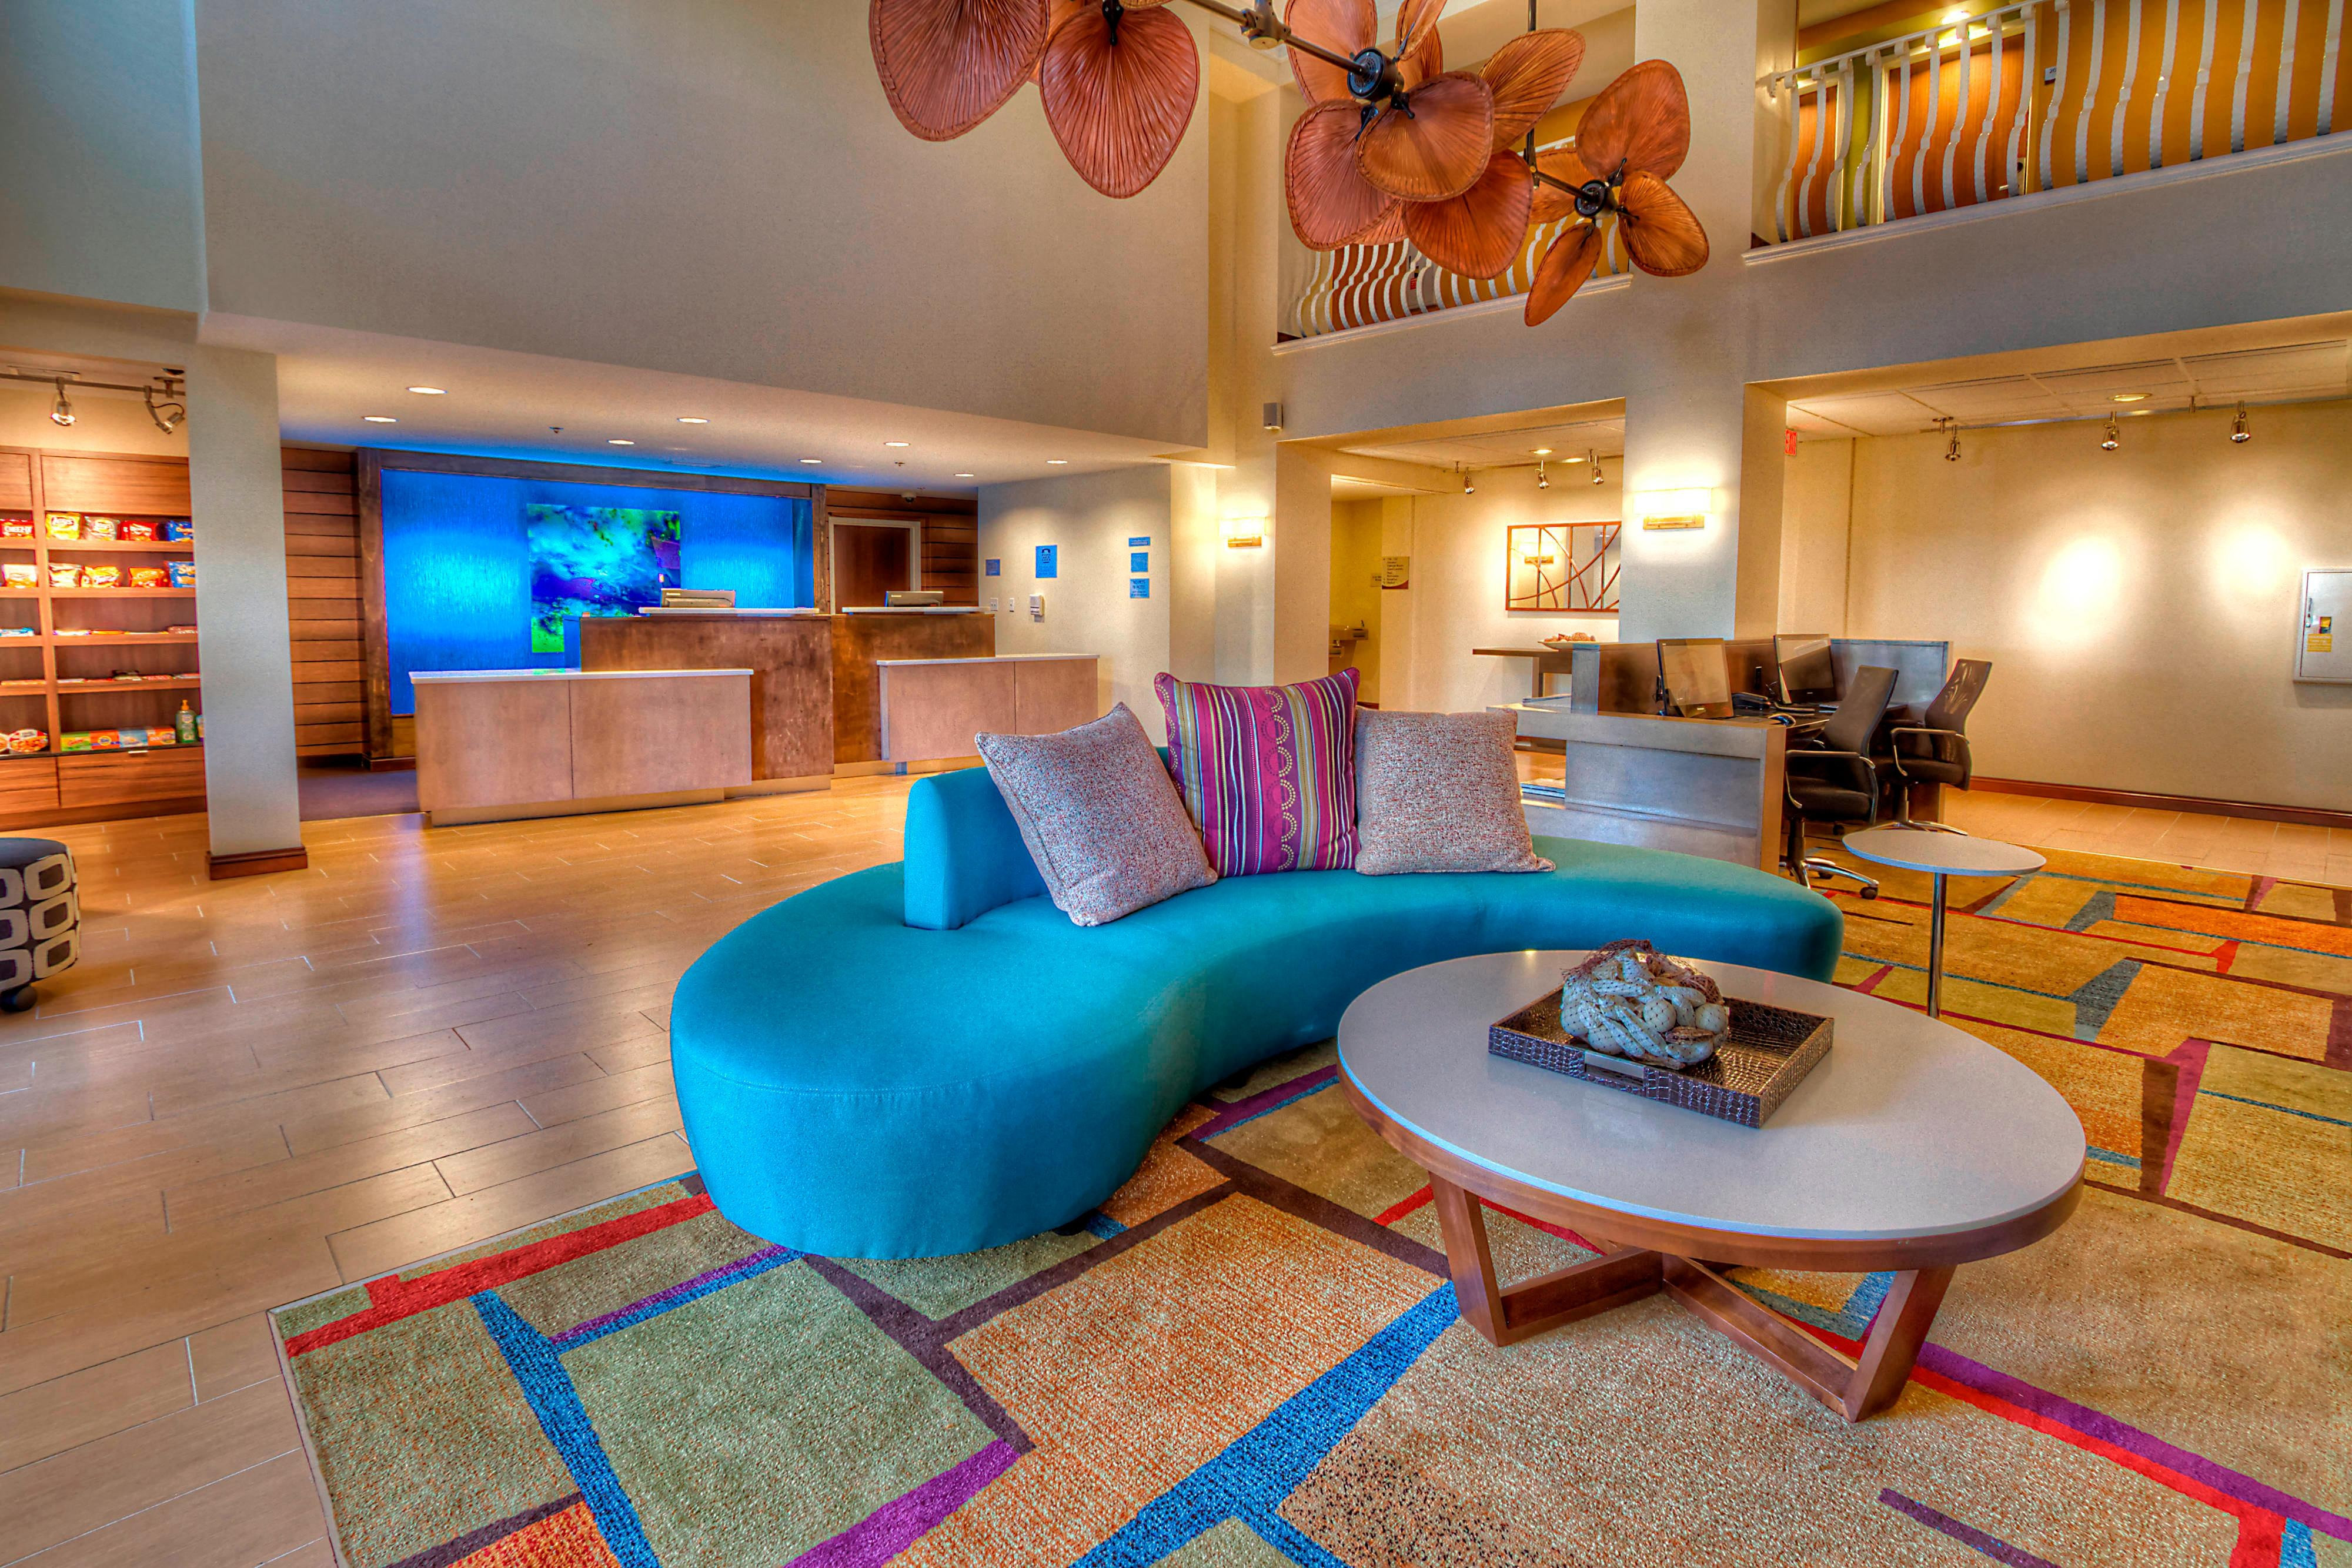 Hotels in Destin Beach Florida